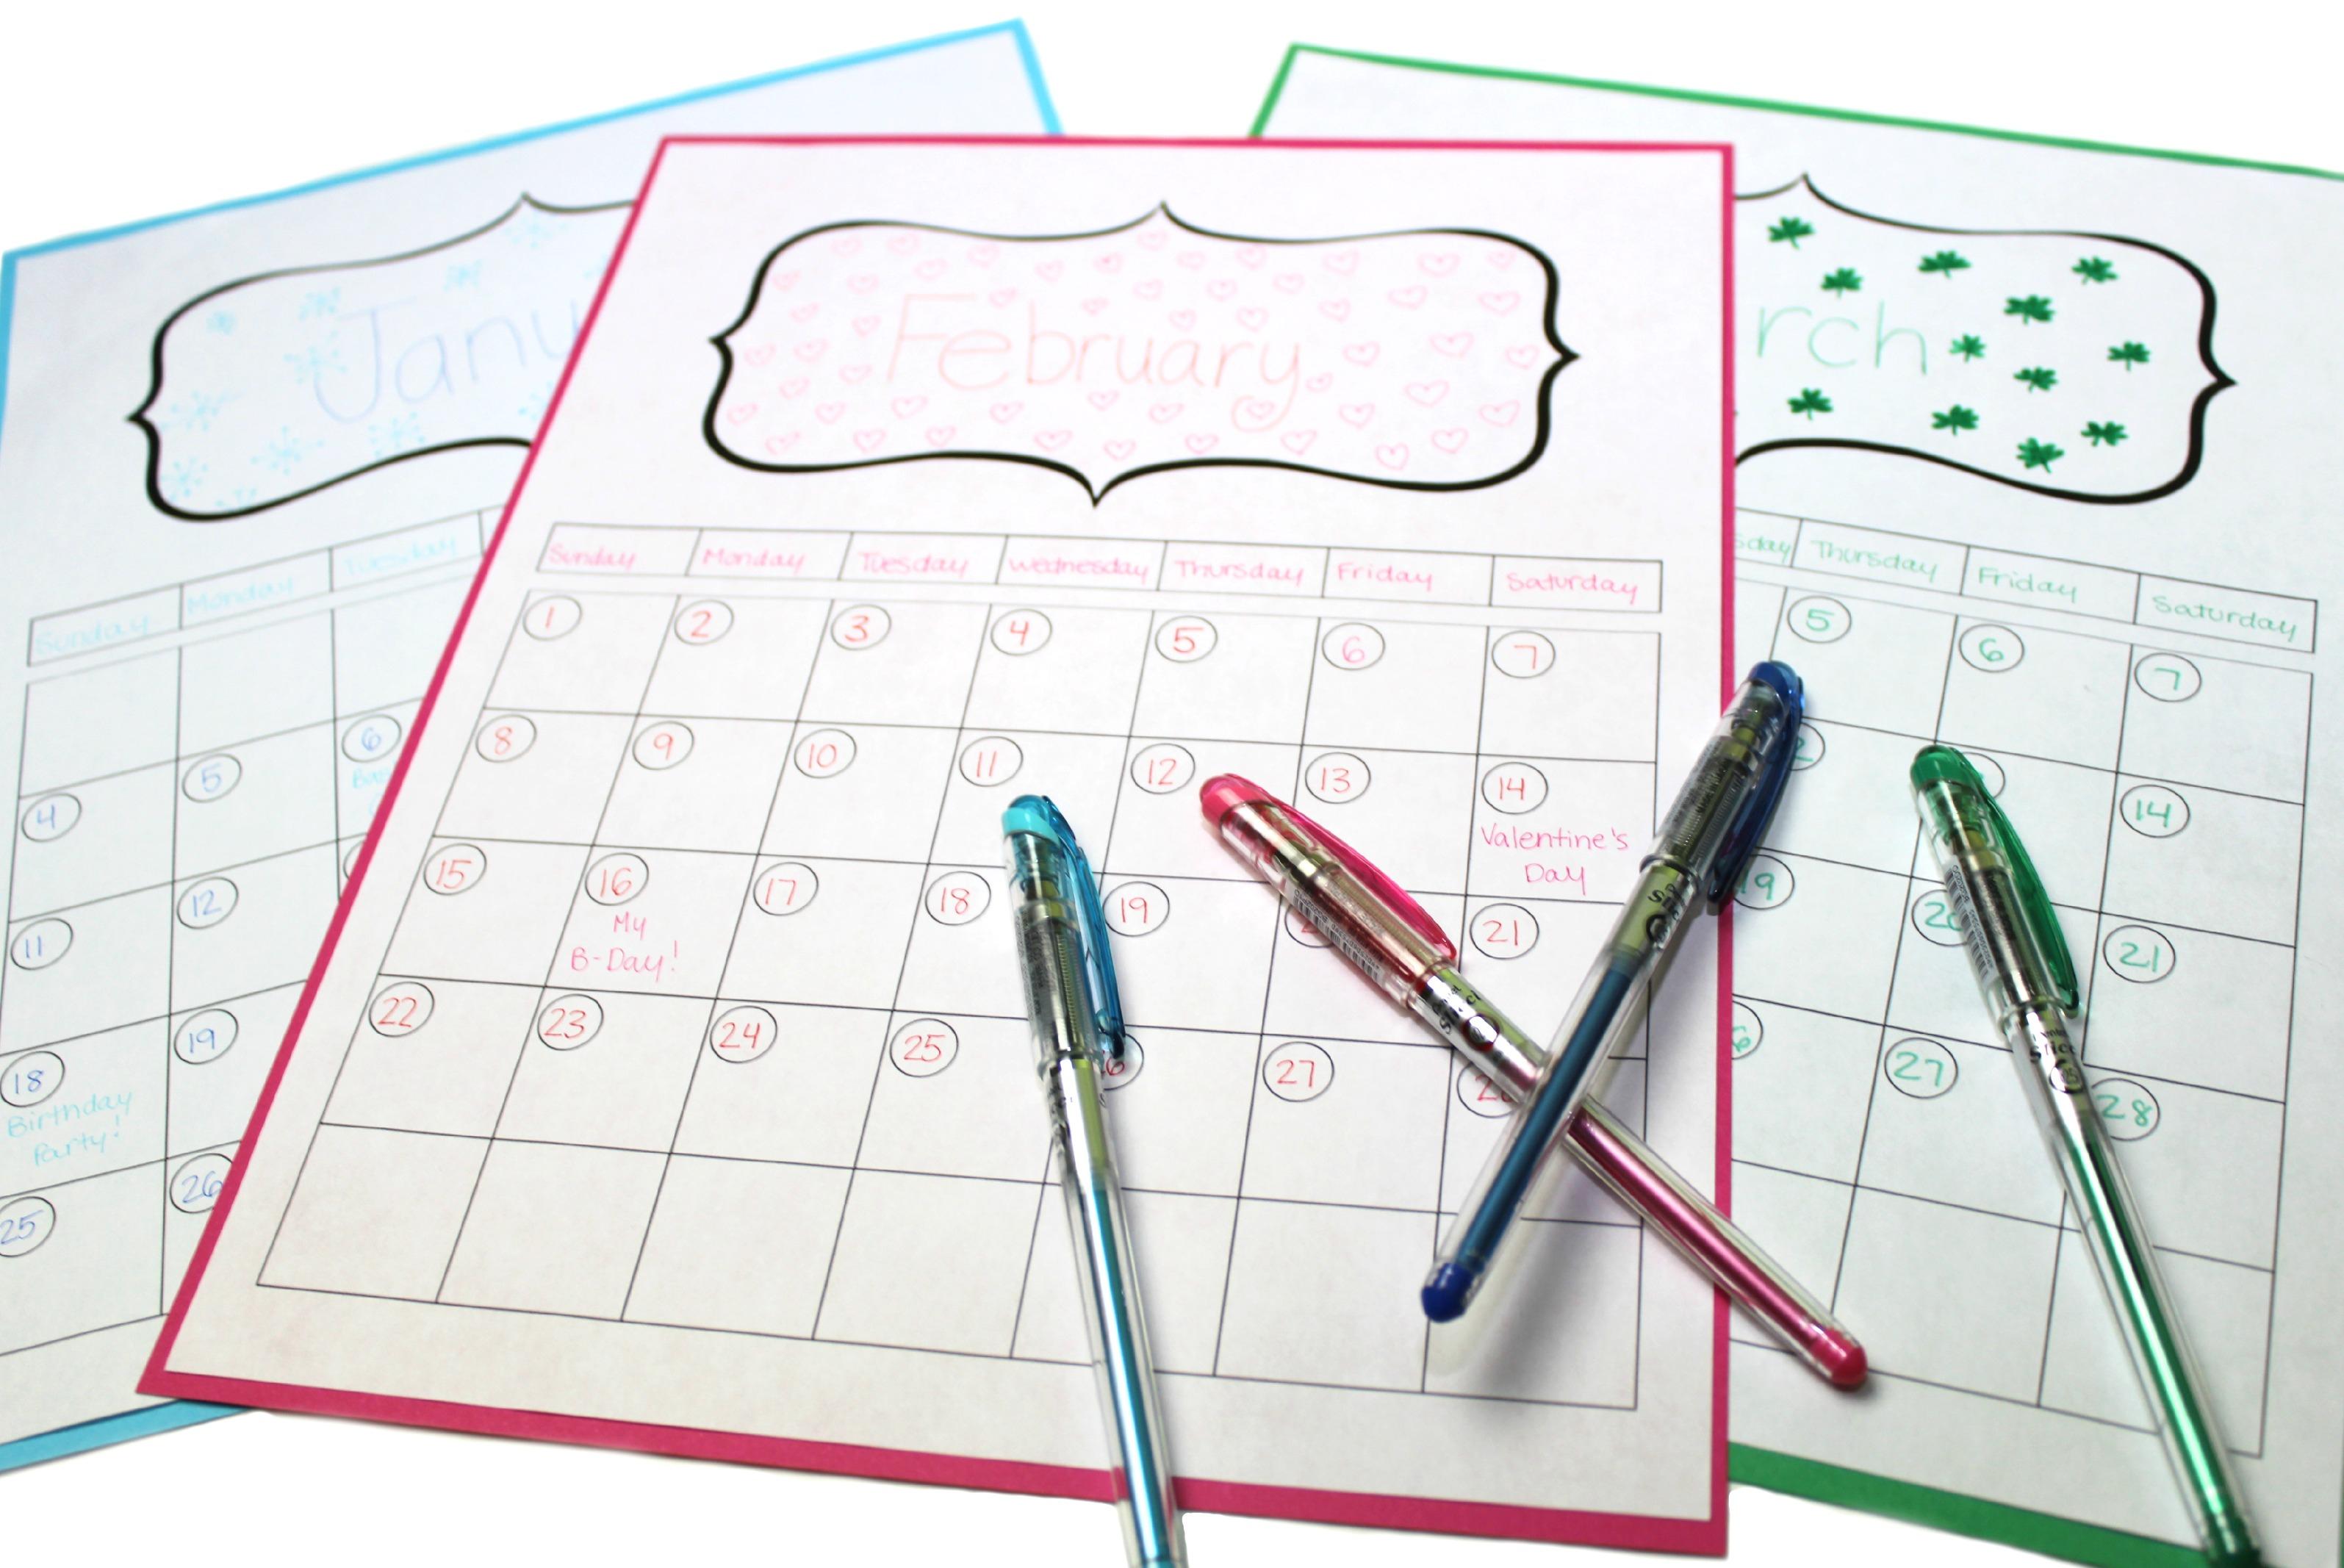 8 Make Your Own Design 2015 Calendar Printable Images With Create Your Own Calendar Printable